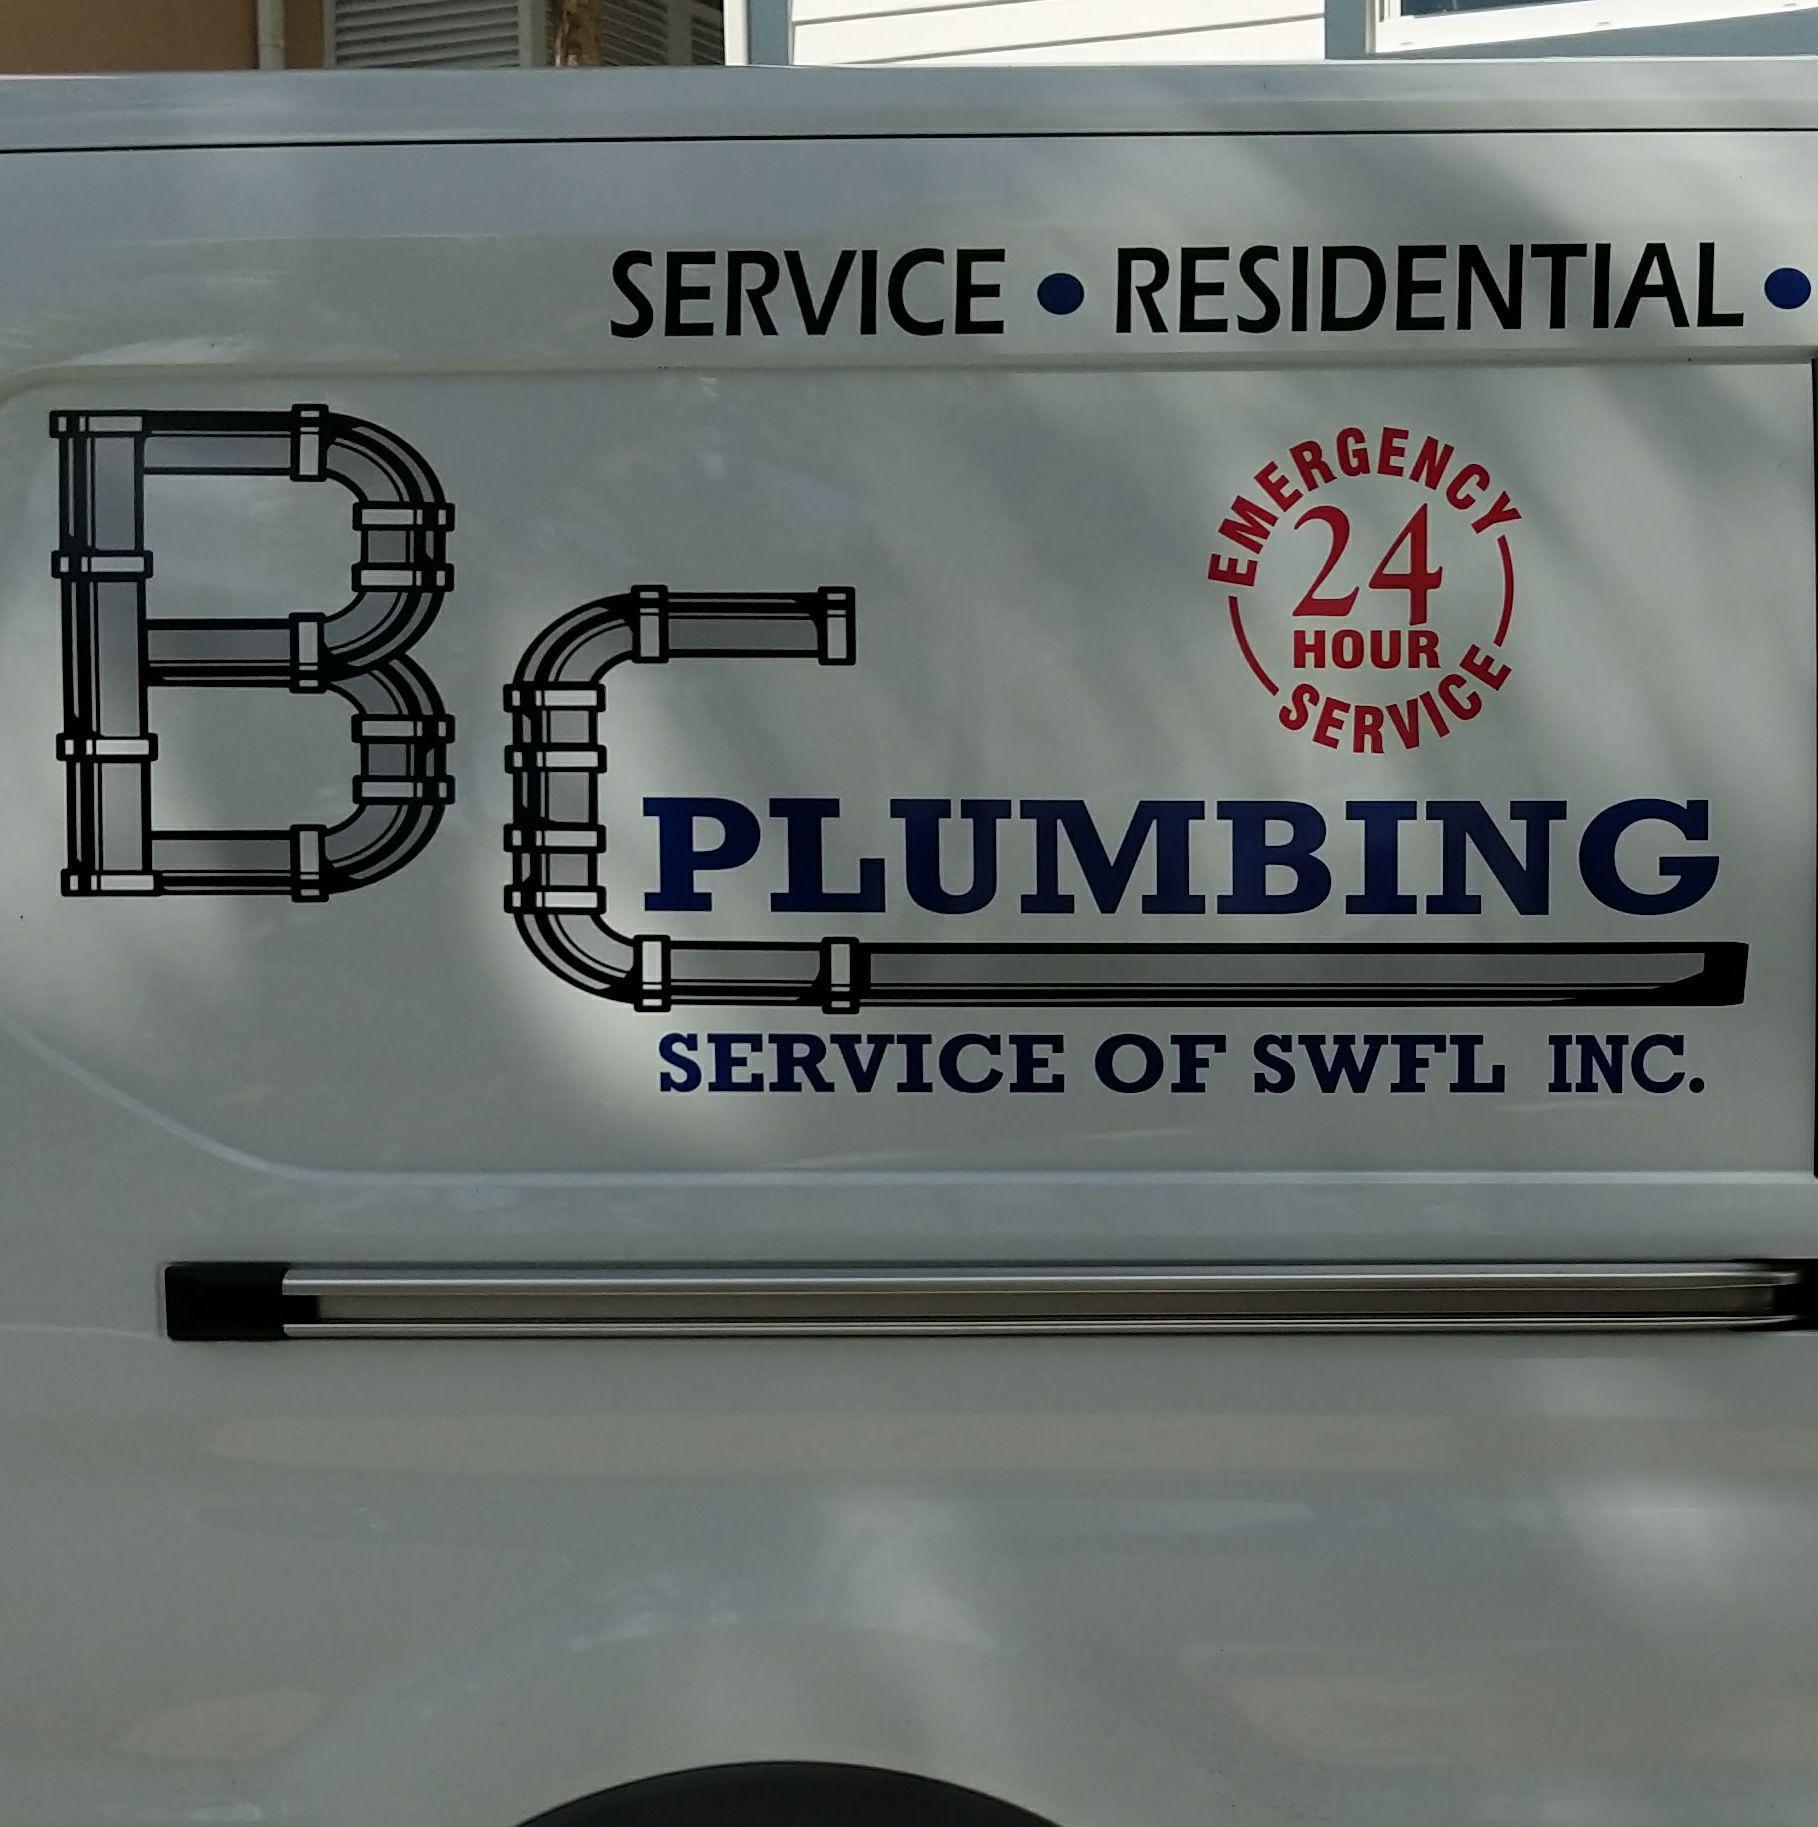 B C Plumbing Service Of SWFL Inc. image 2